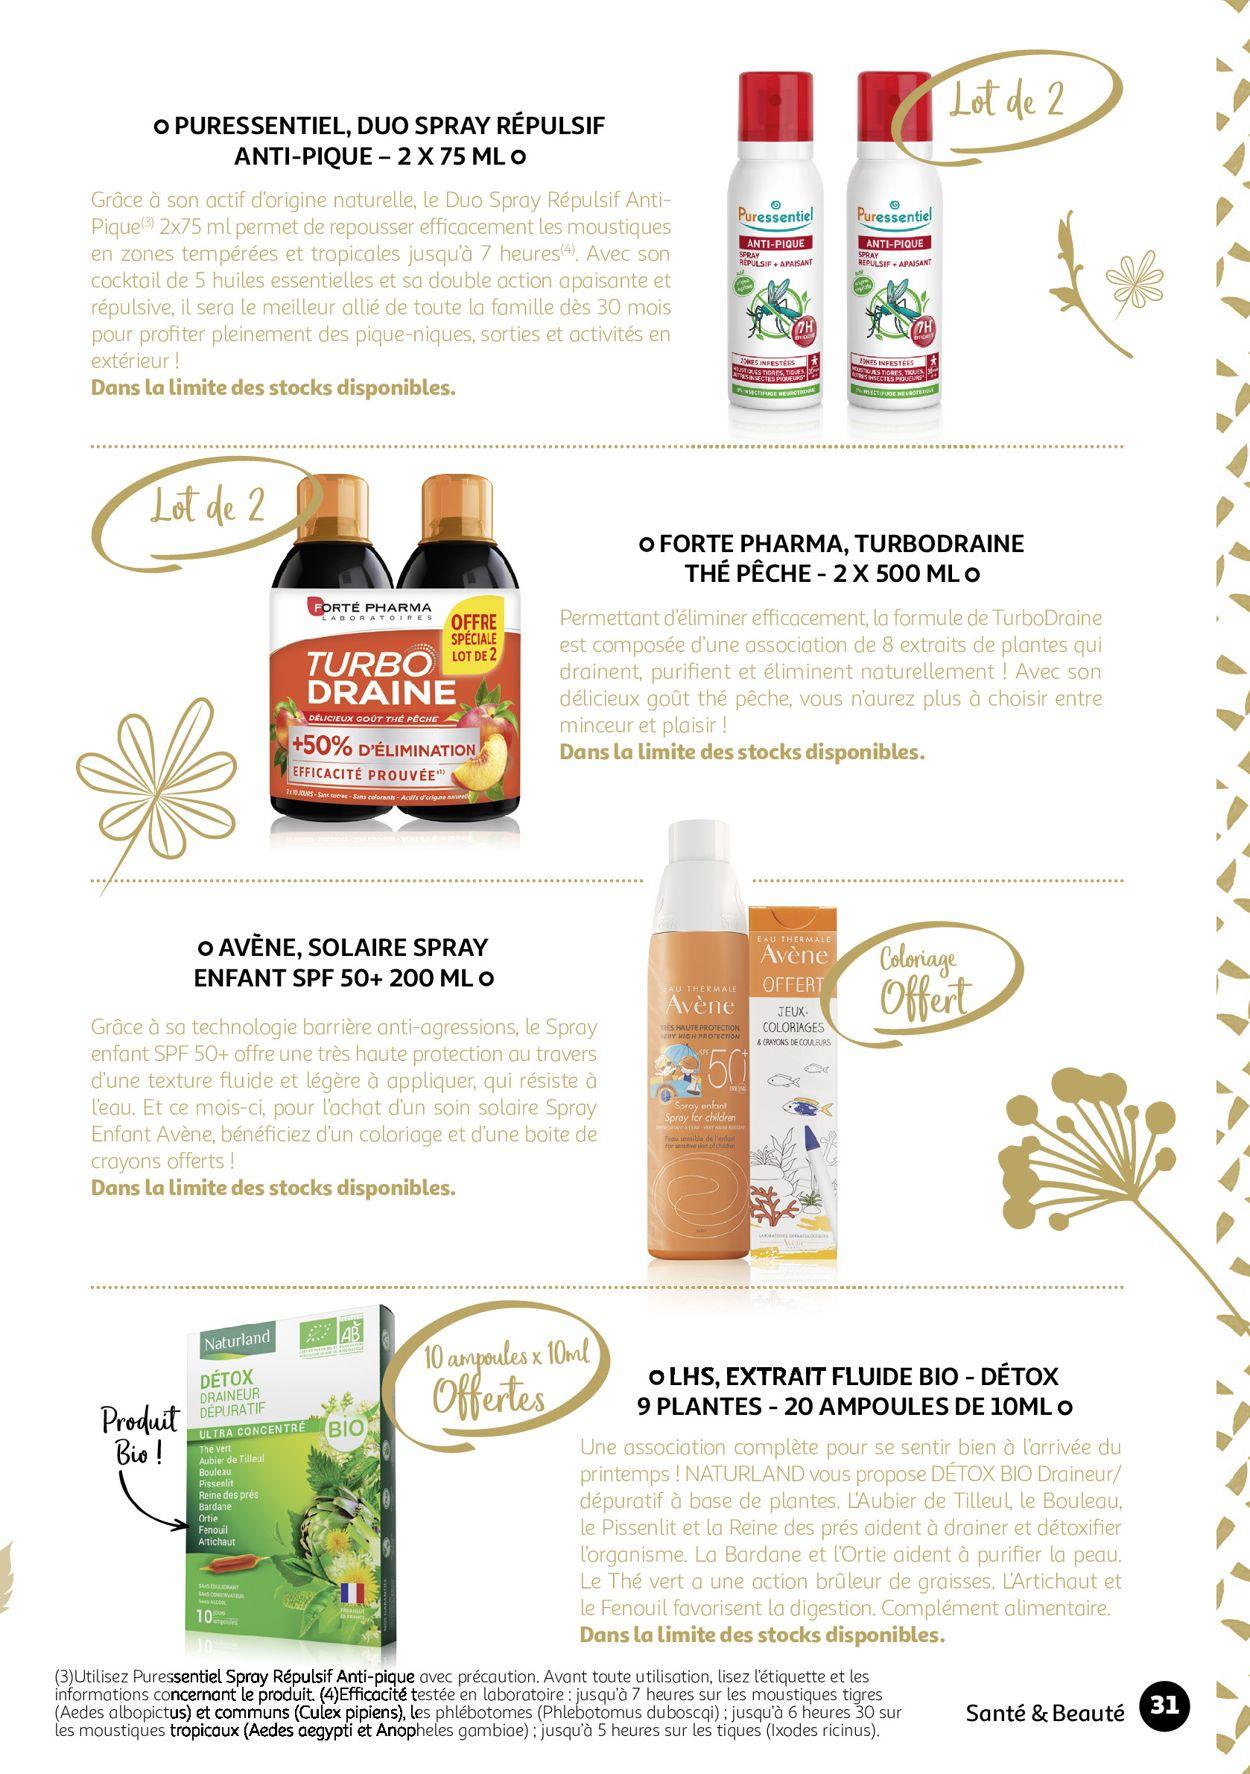 Auchan Catalogue - 01.03-01.06.2021 (Page 31)